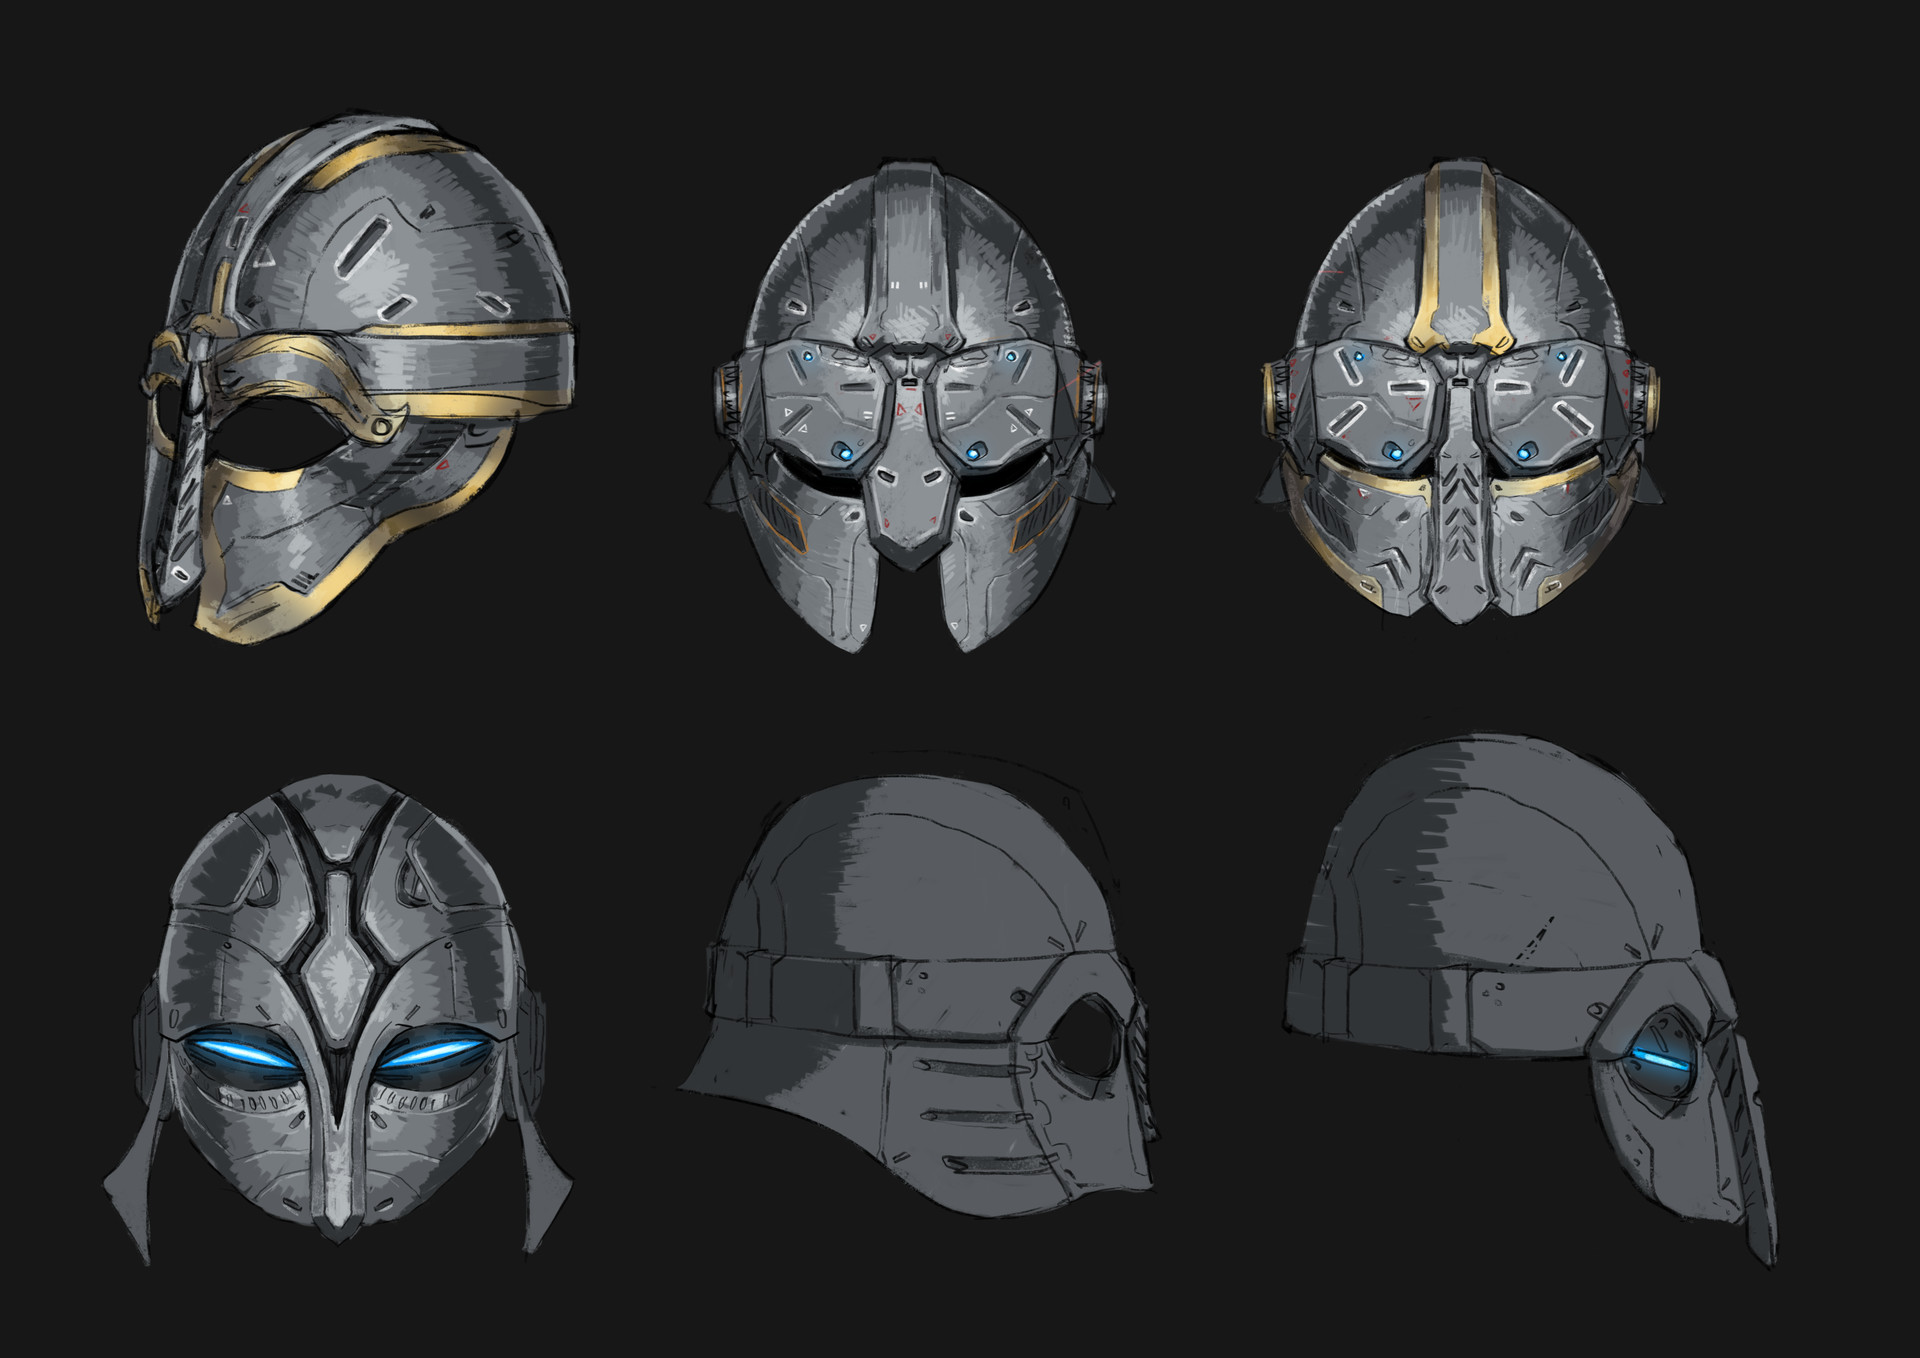 Erlend capodanno helment design02